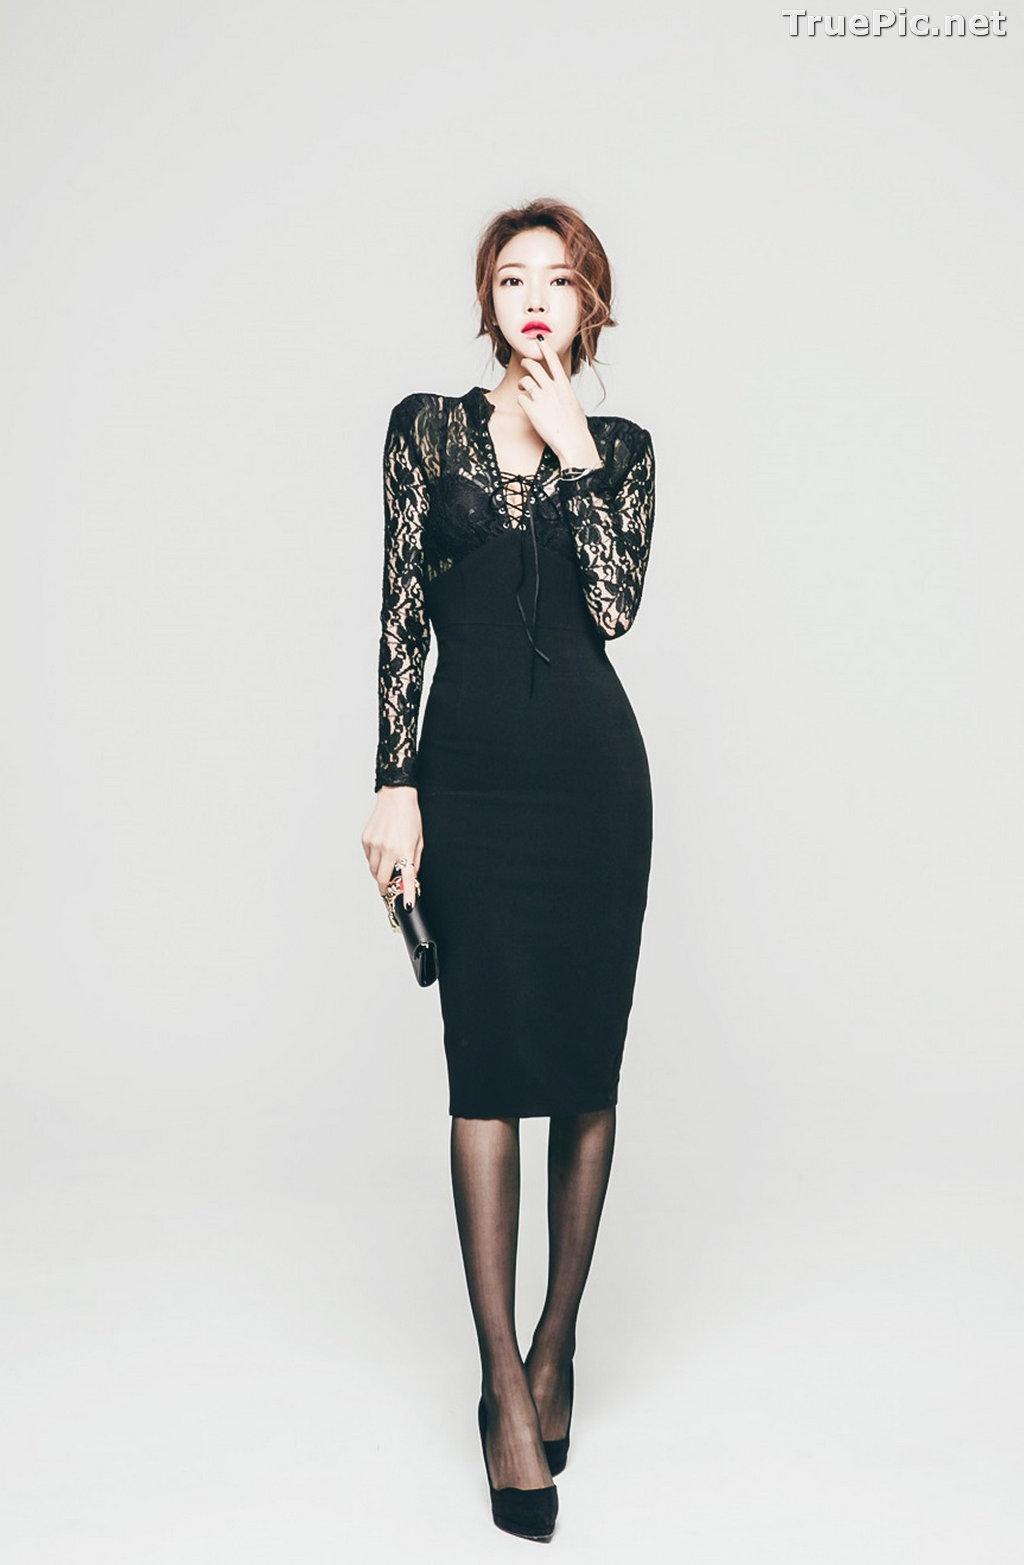 Image Korean Beautiful Model – Park Jung Yoon – Fashion Photography #11 - TruePic.net - Picture-64